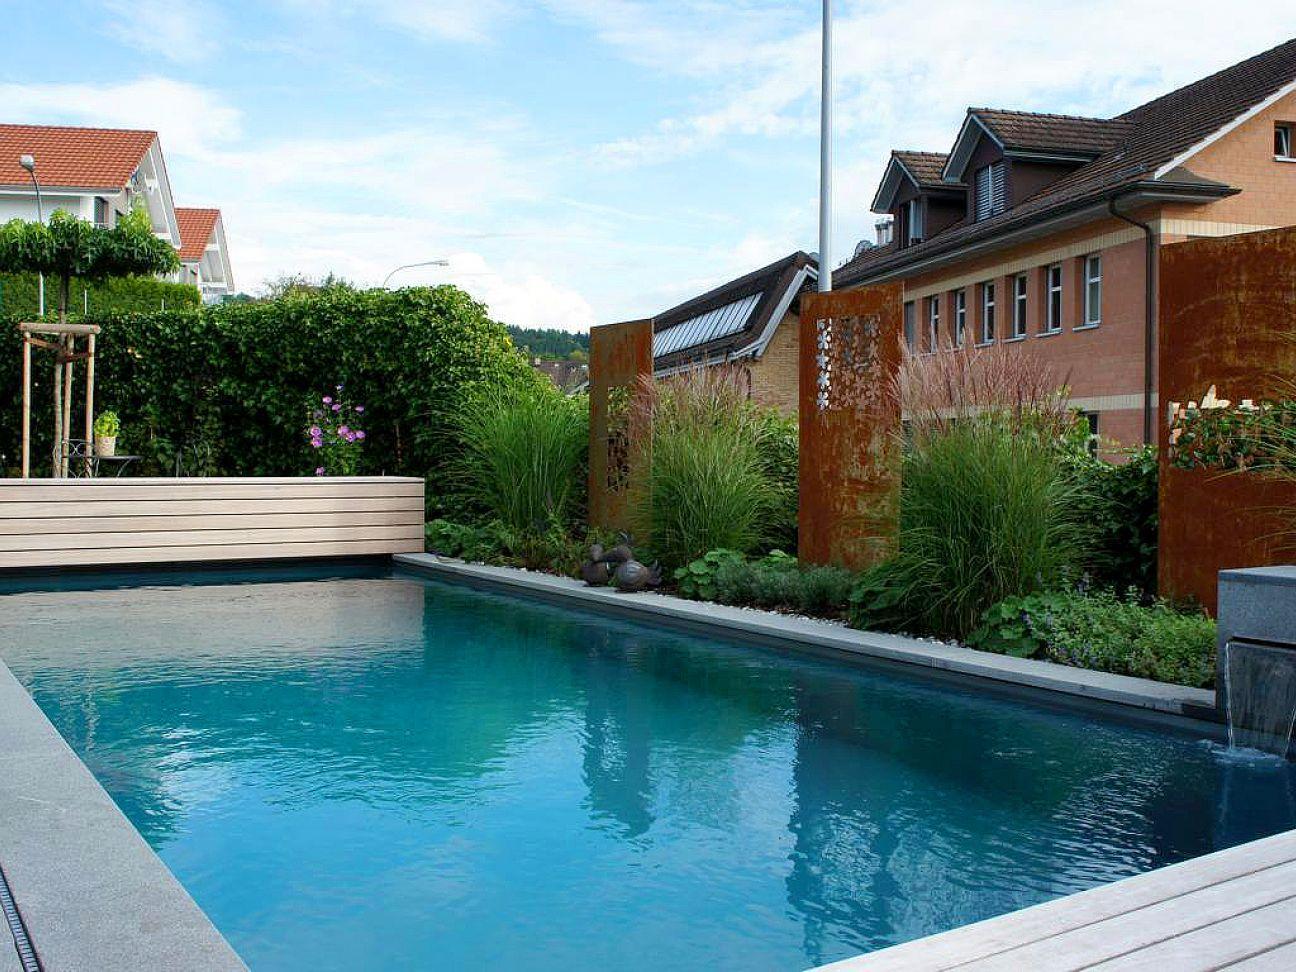 Living Pool Swimmingpool Schwimmteich Gartenbau Gartenumbau